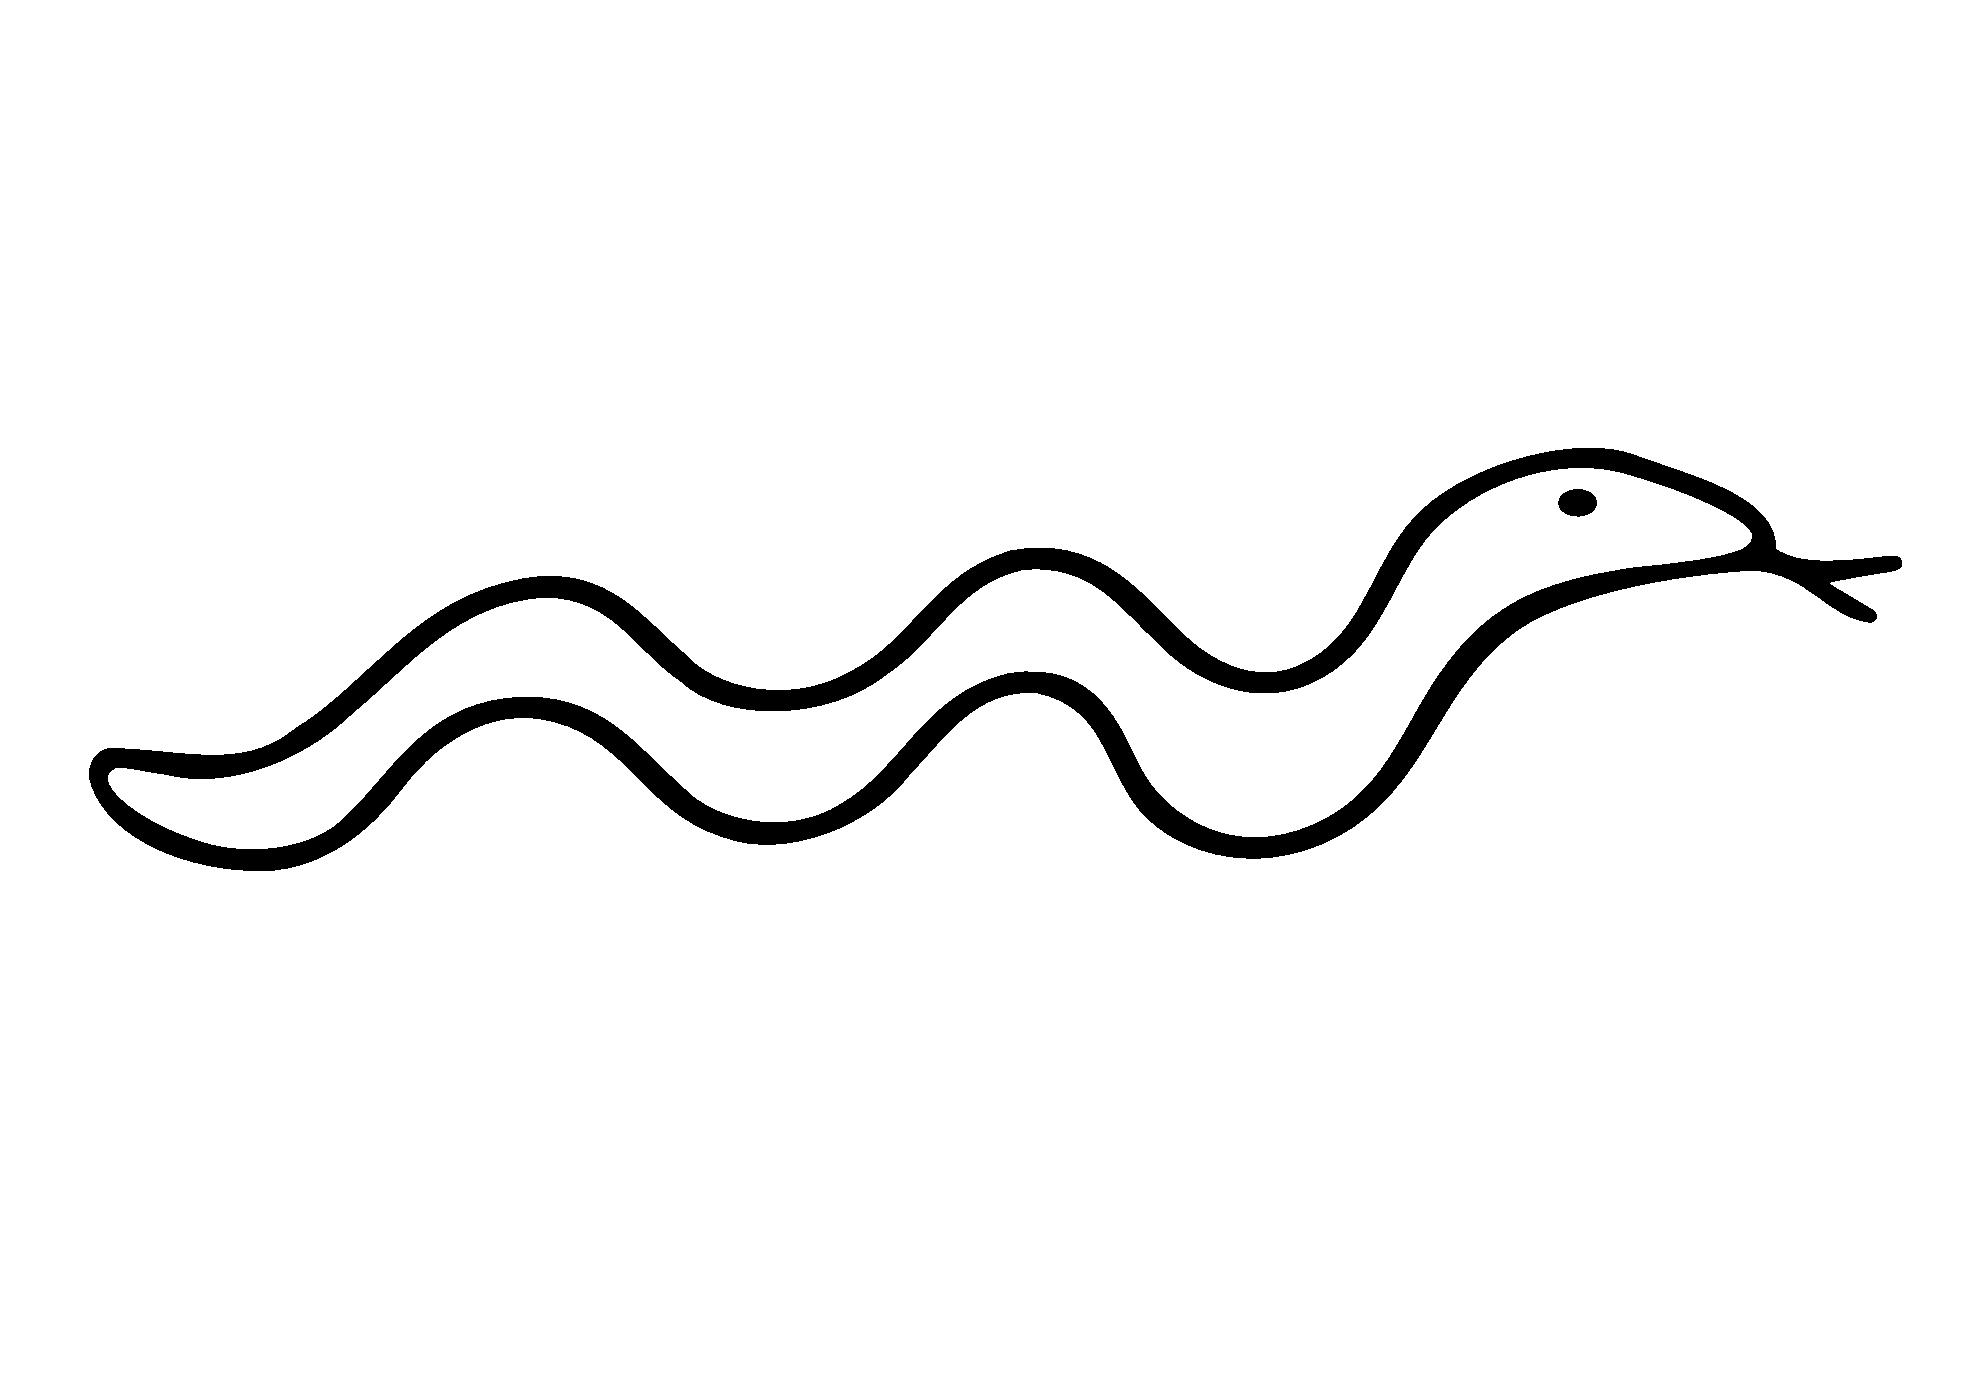 1969x1392 Snake Clip Art Adiestradorescastro Clipart